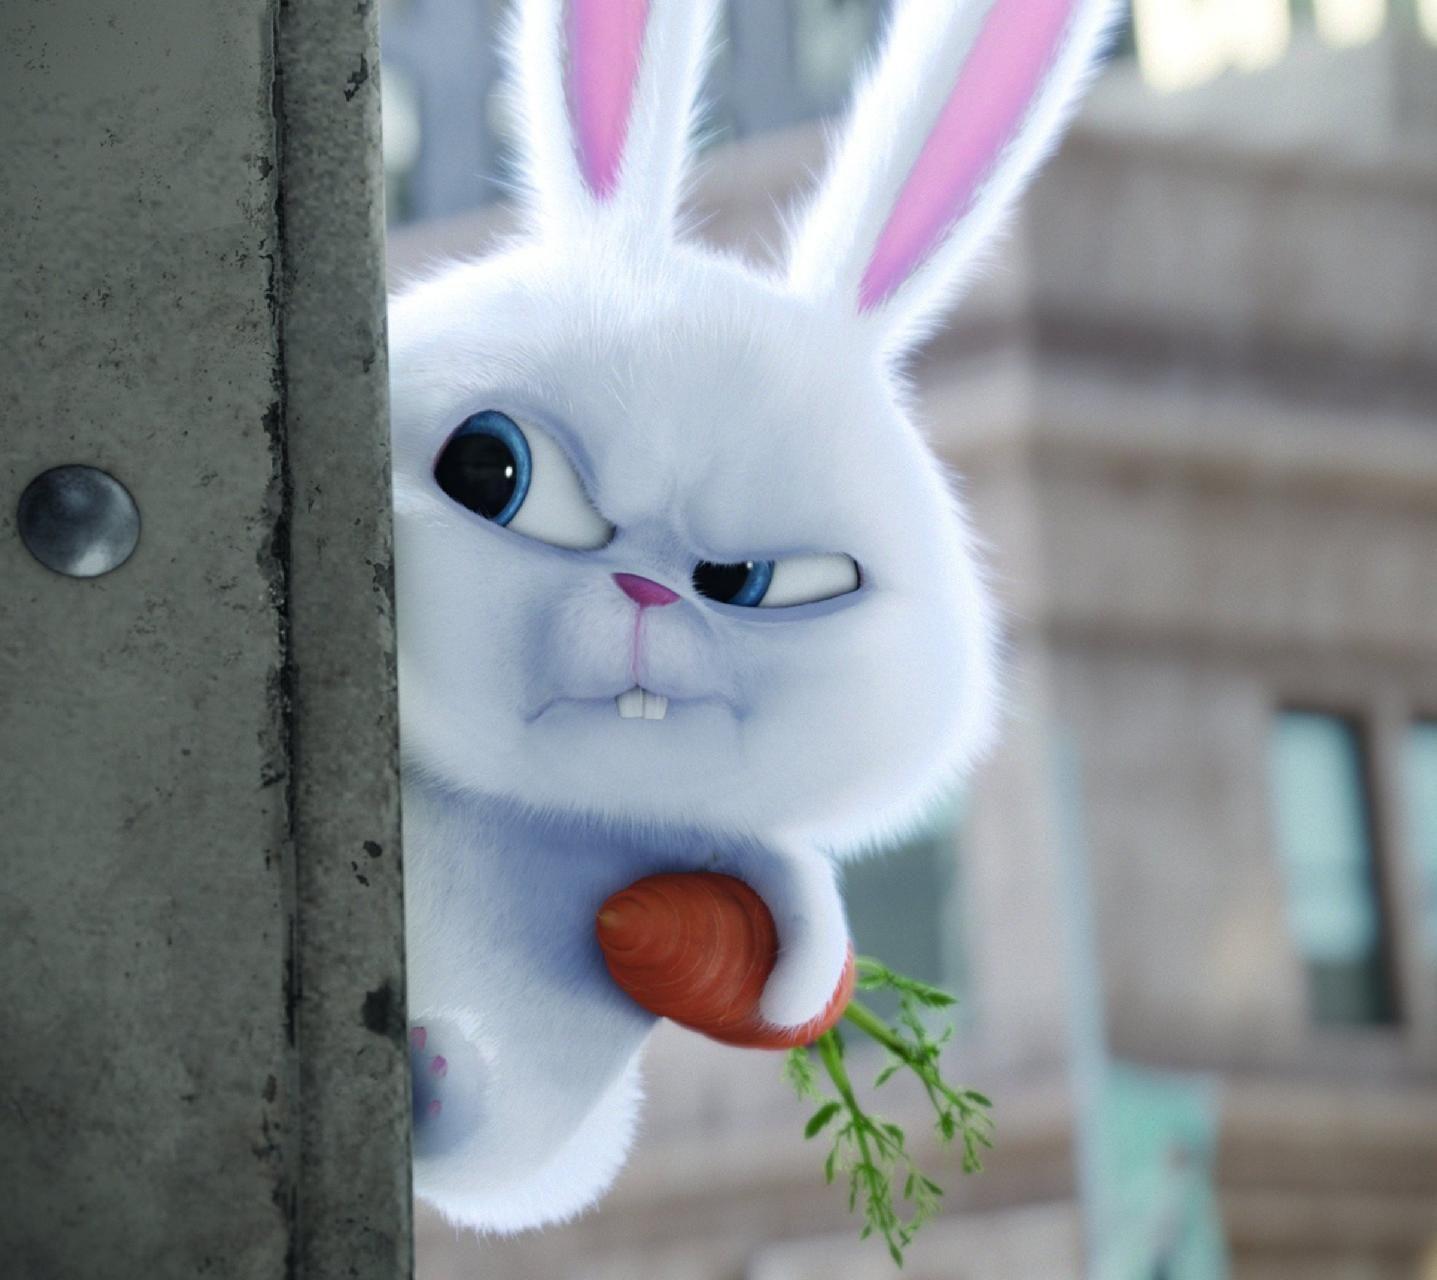 Download Bunny Wallpaper By Ahkioz F3 Free On Zedge Now